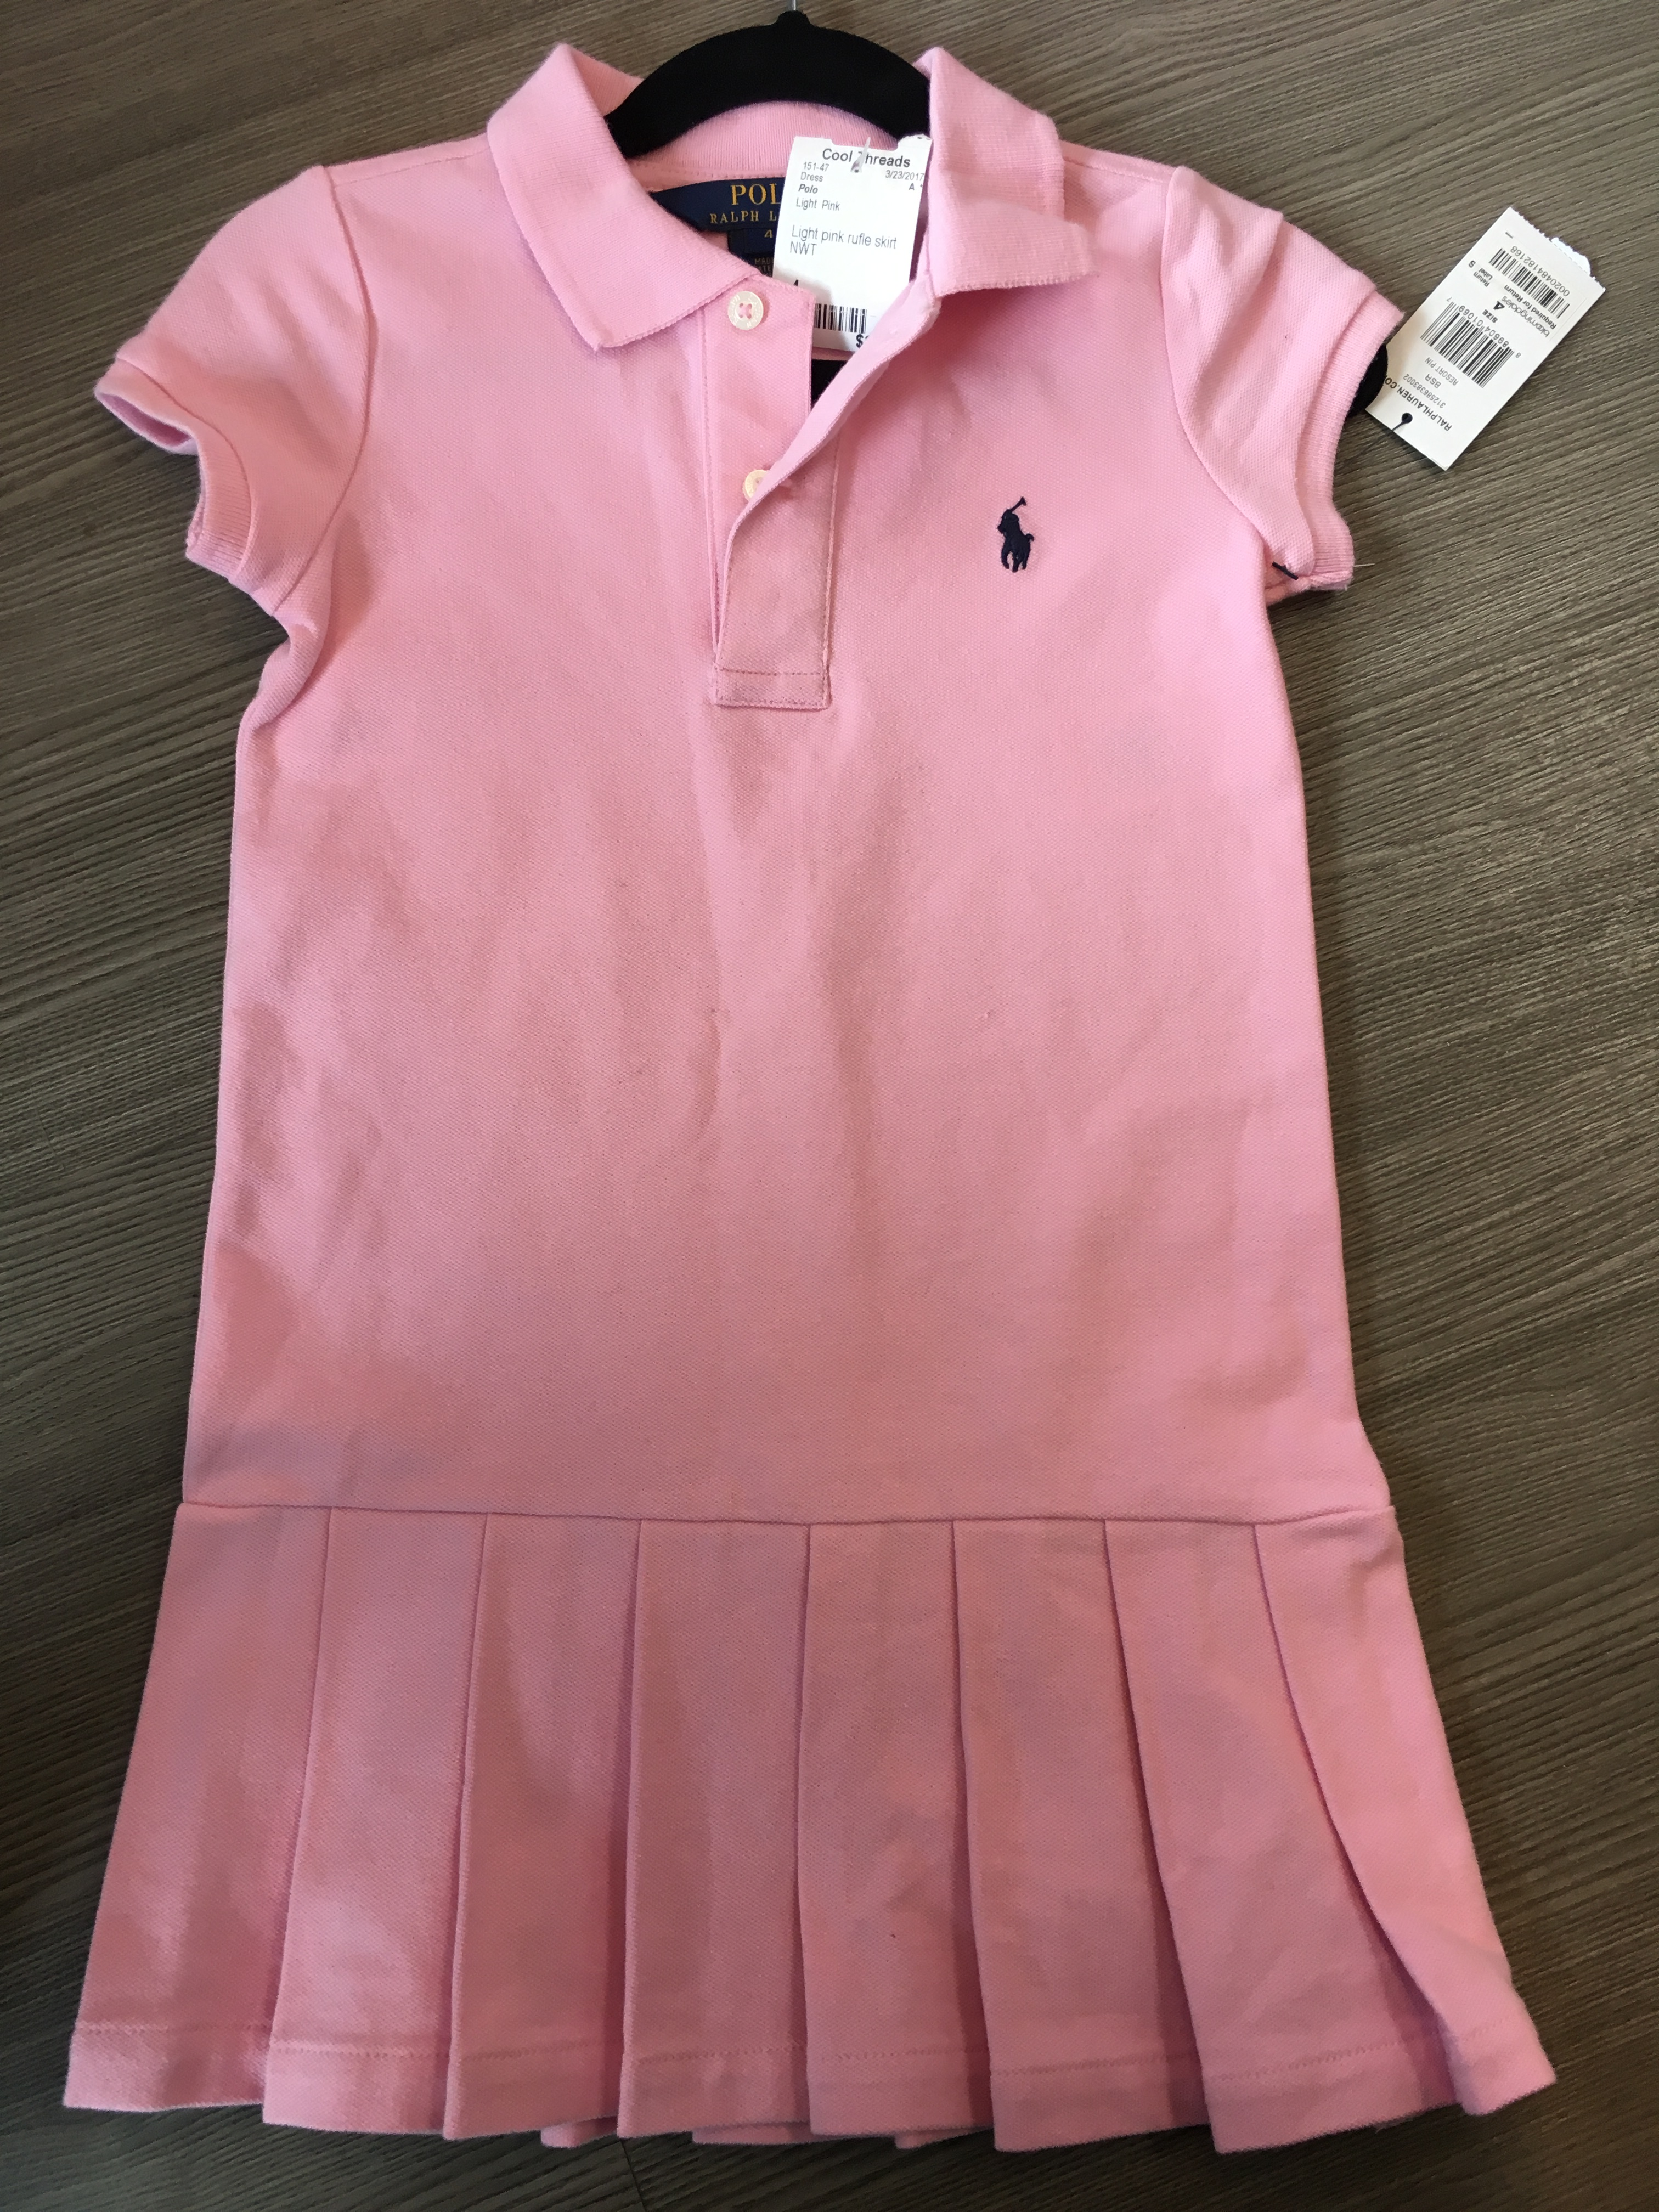 Polo-Size-4-Light--Pink-Dress_8408A.jpg